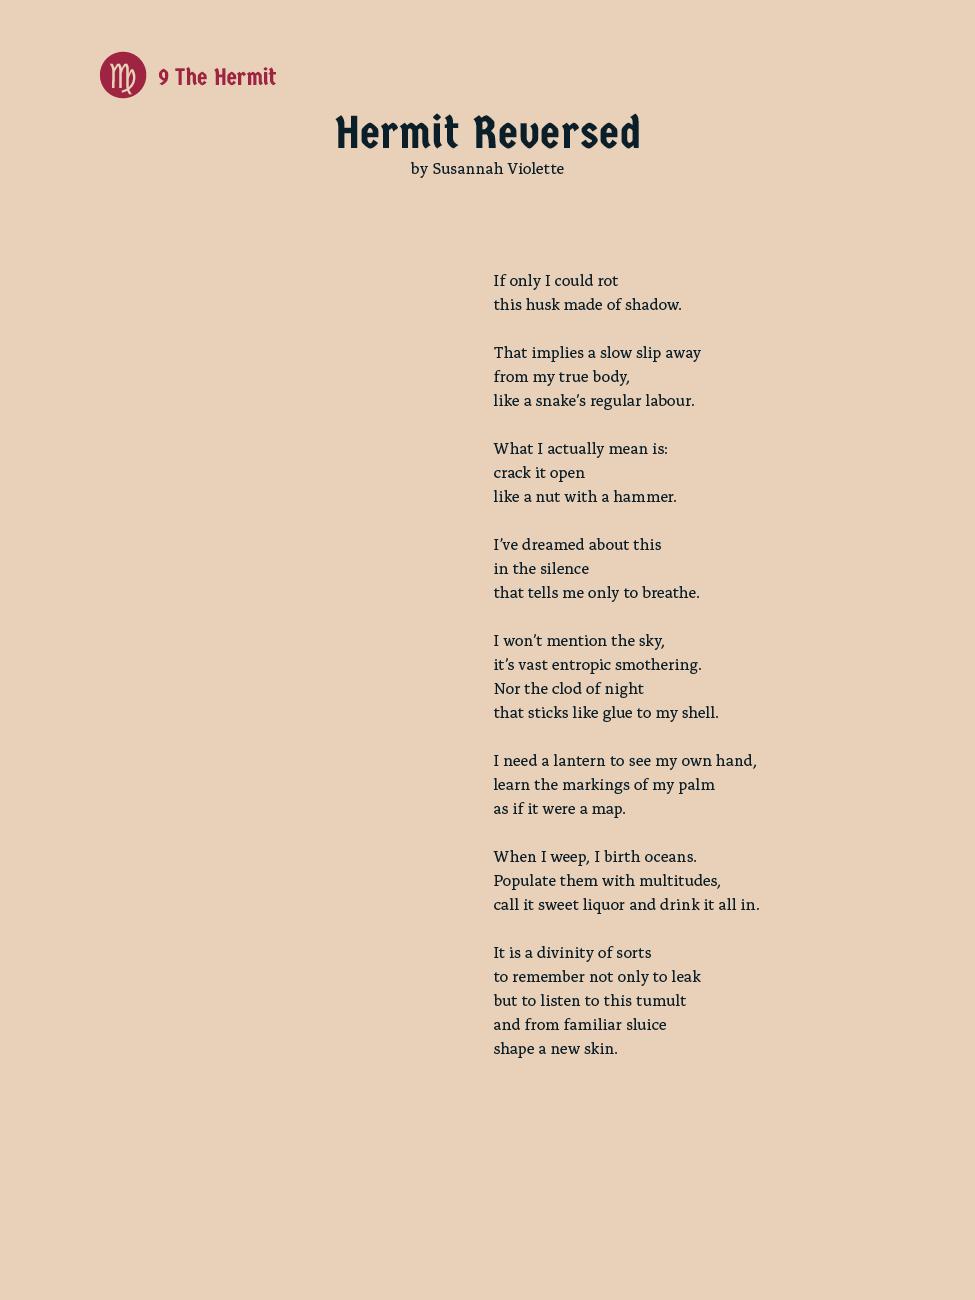 9 The Hermit - Hermit Reversed - Susannah Violette